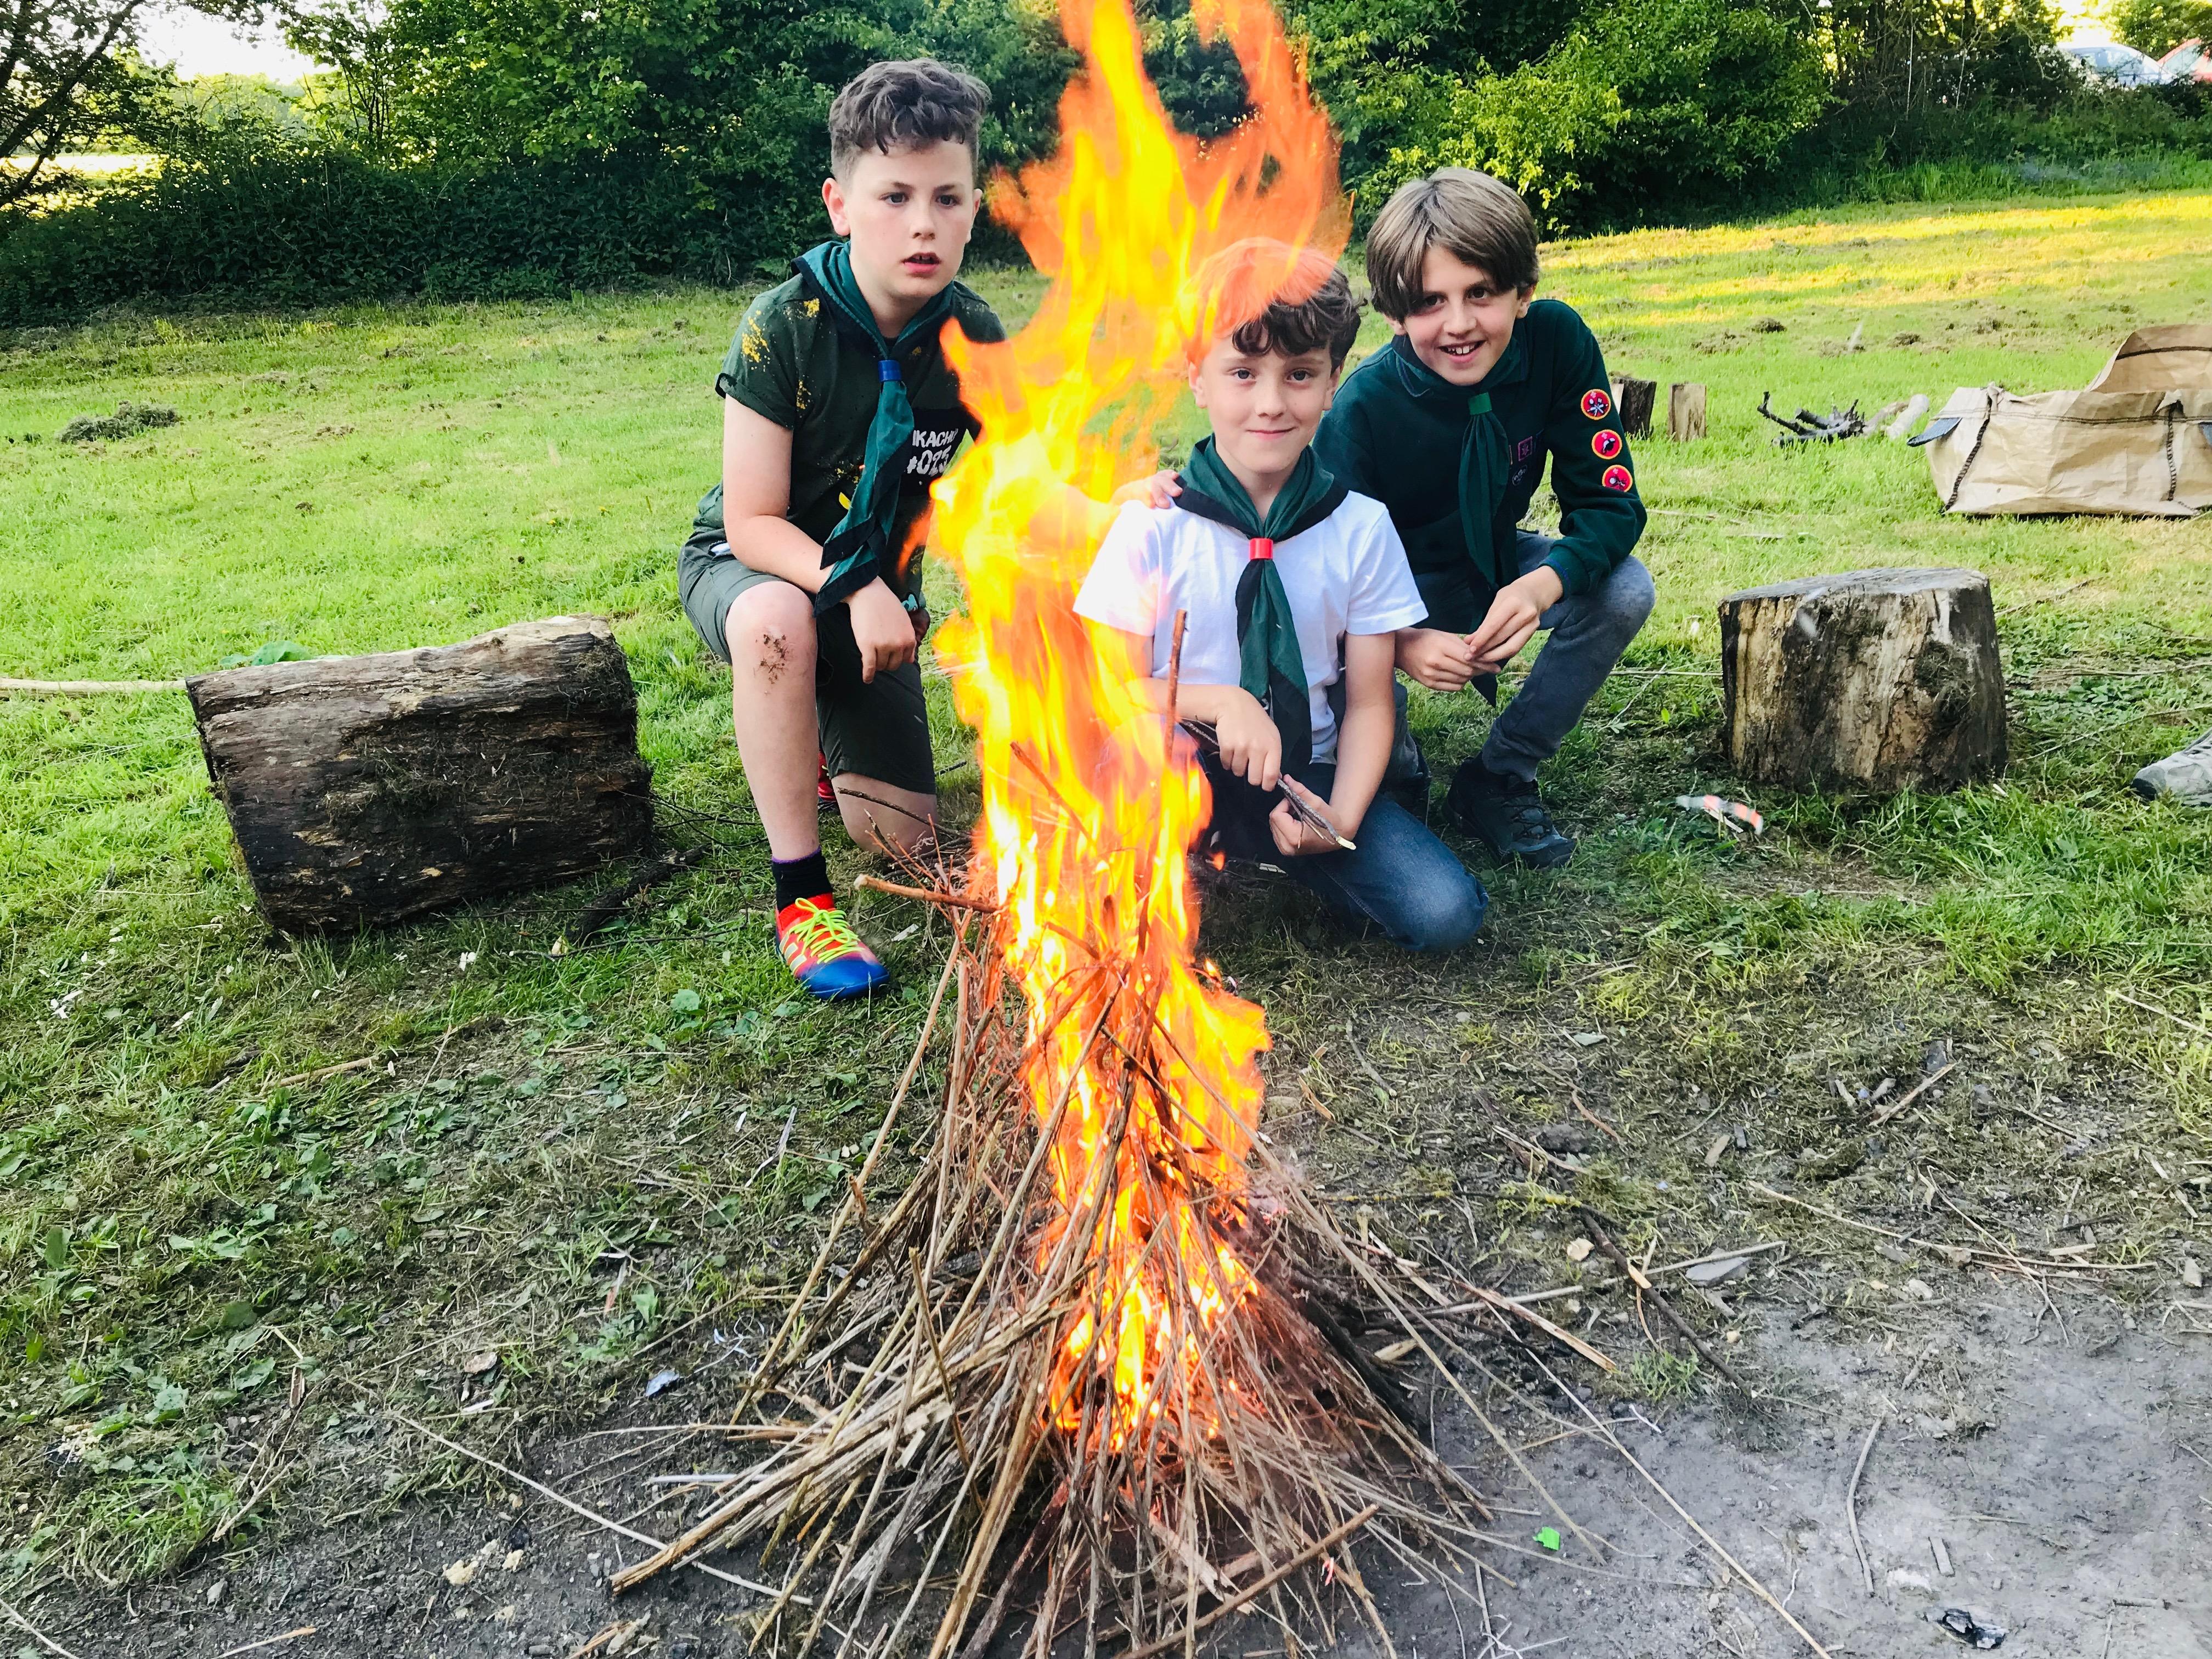 Cubs Firelighting at Welton Campsite June 2019